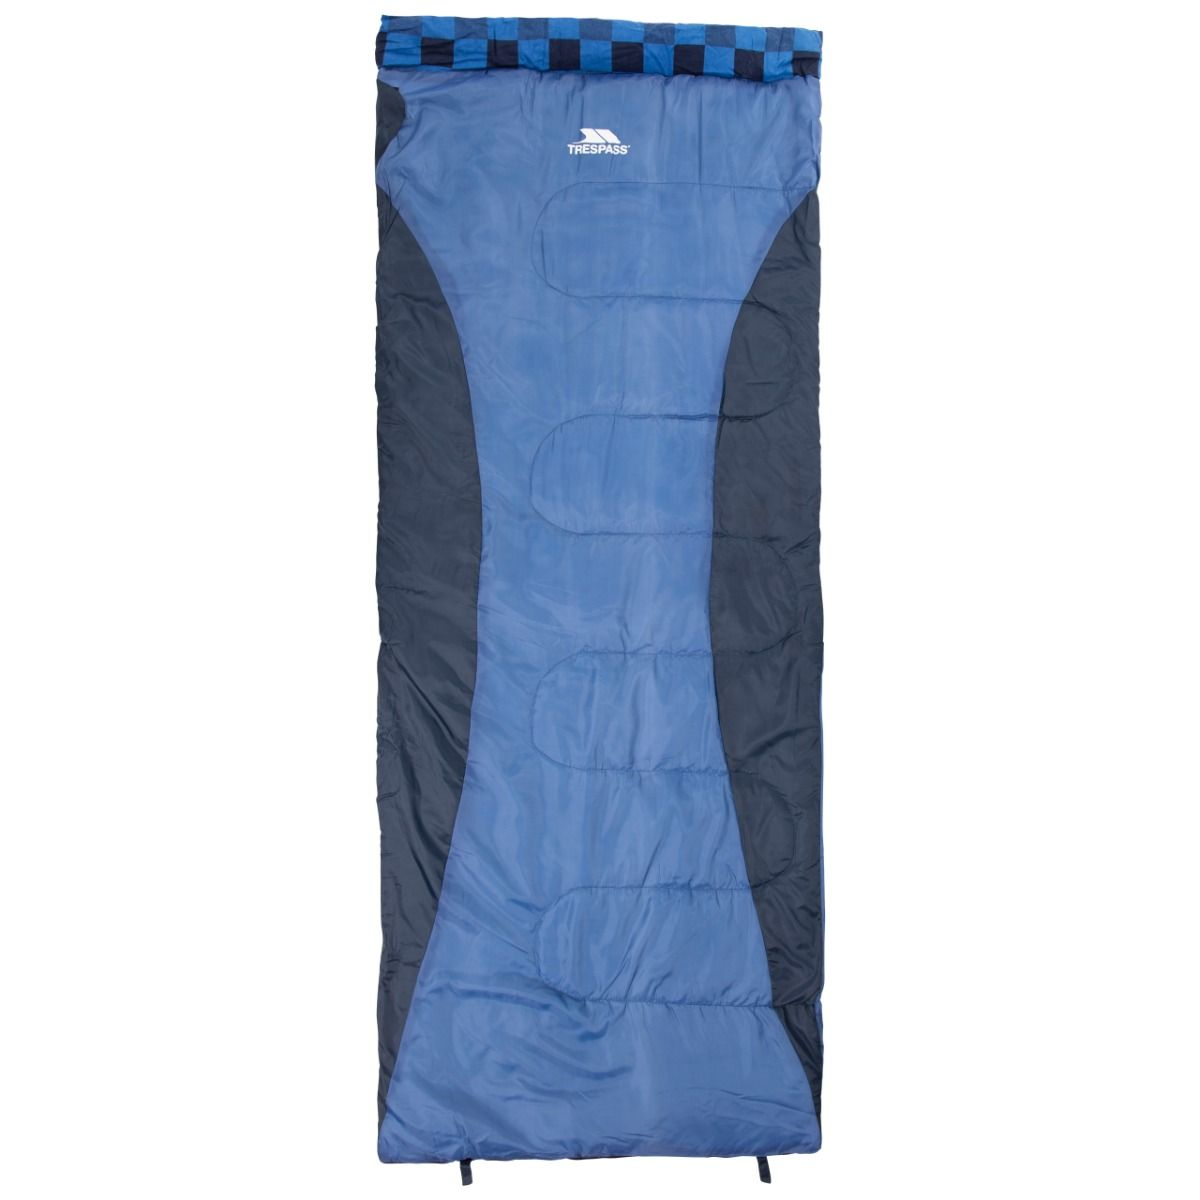 Trespass 4 Season Sleeping Bag Water Resistant Pitched